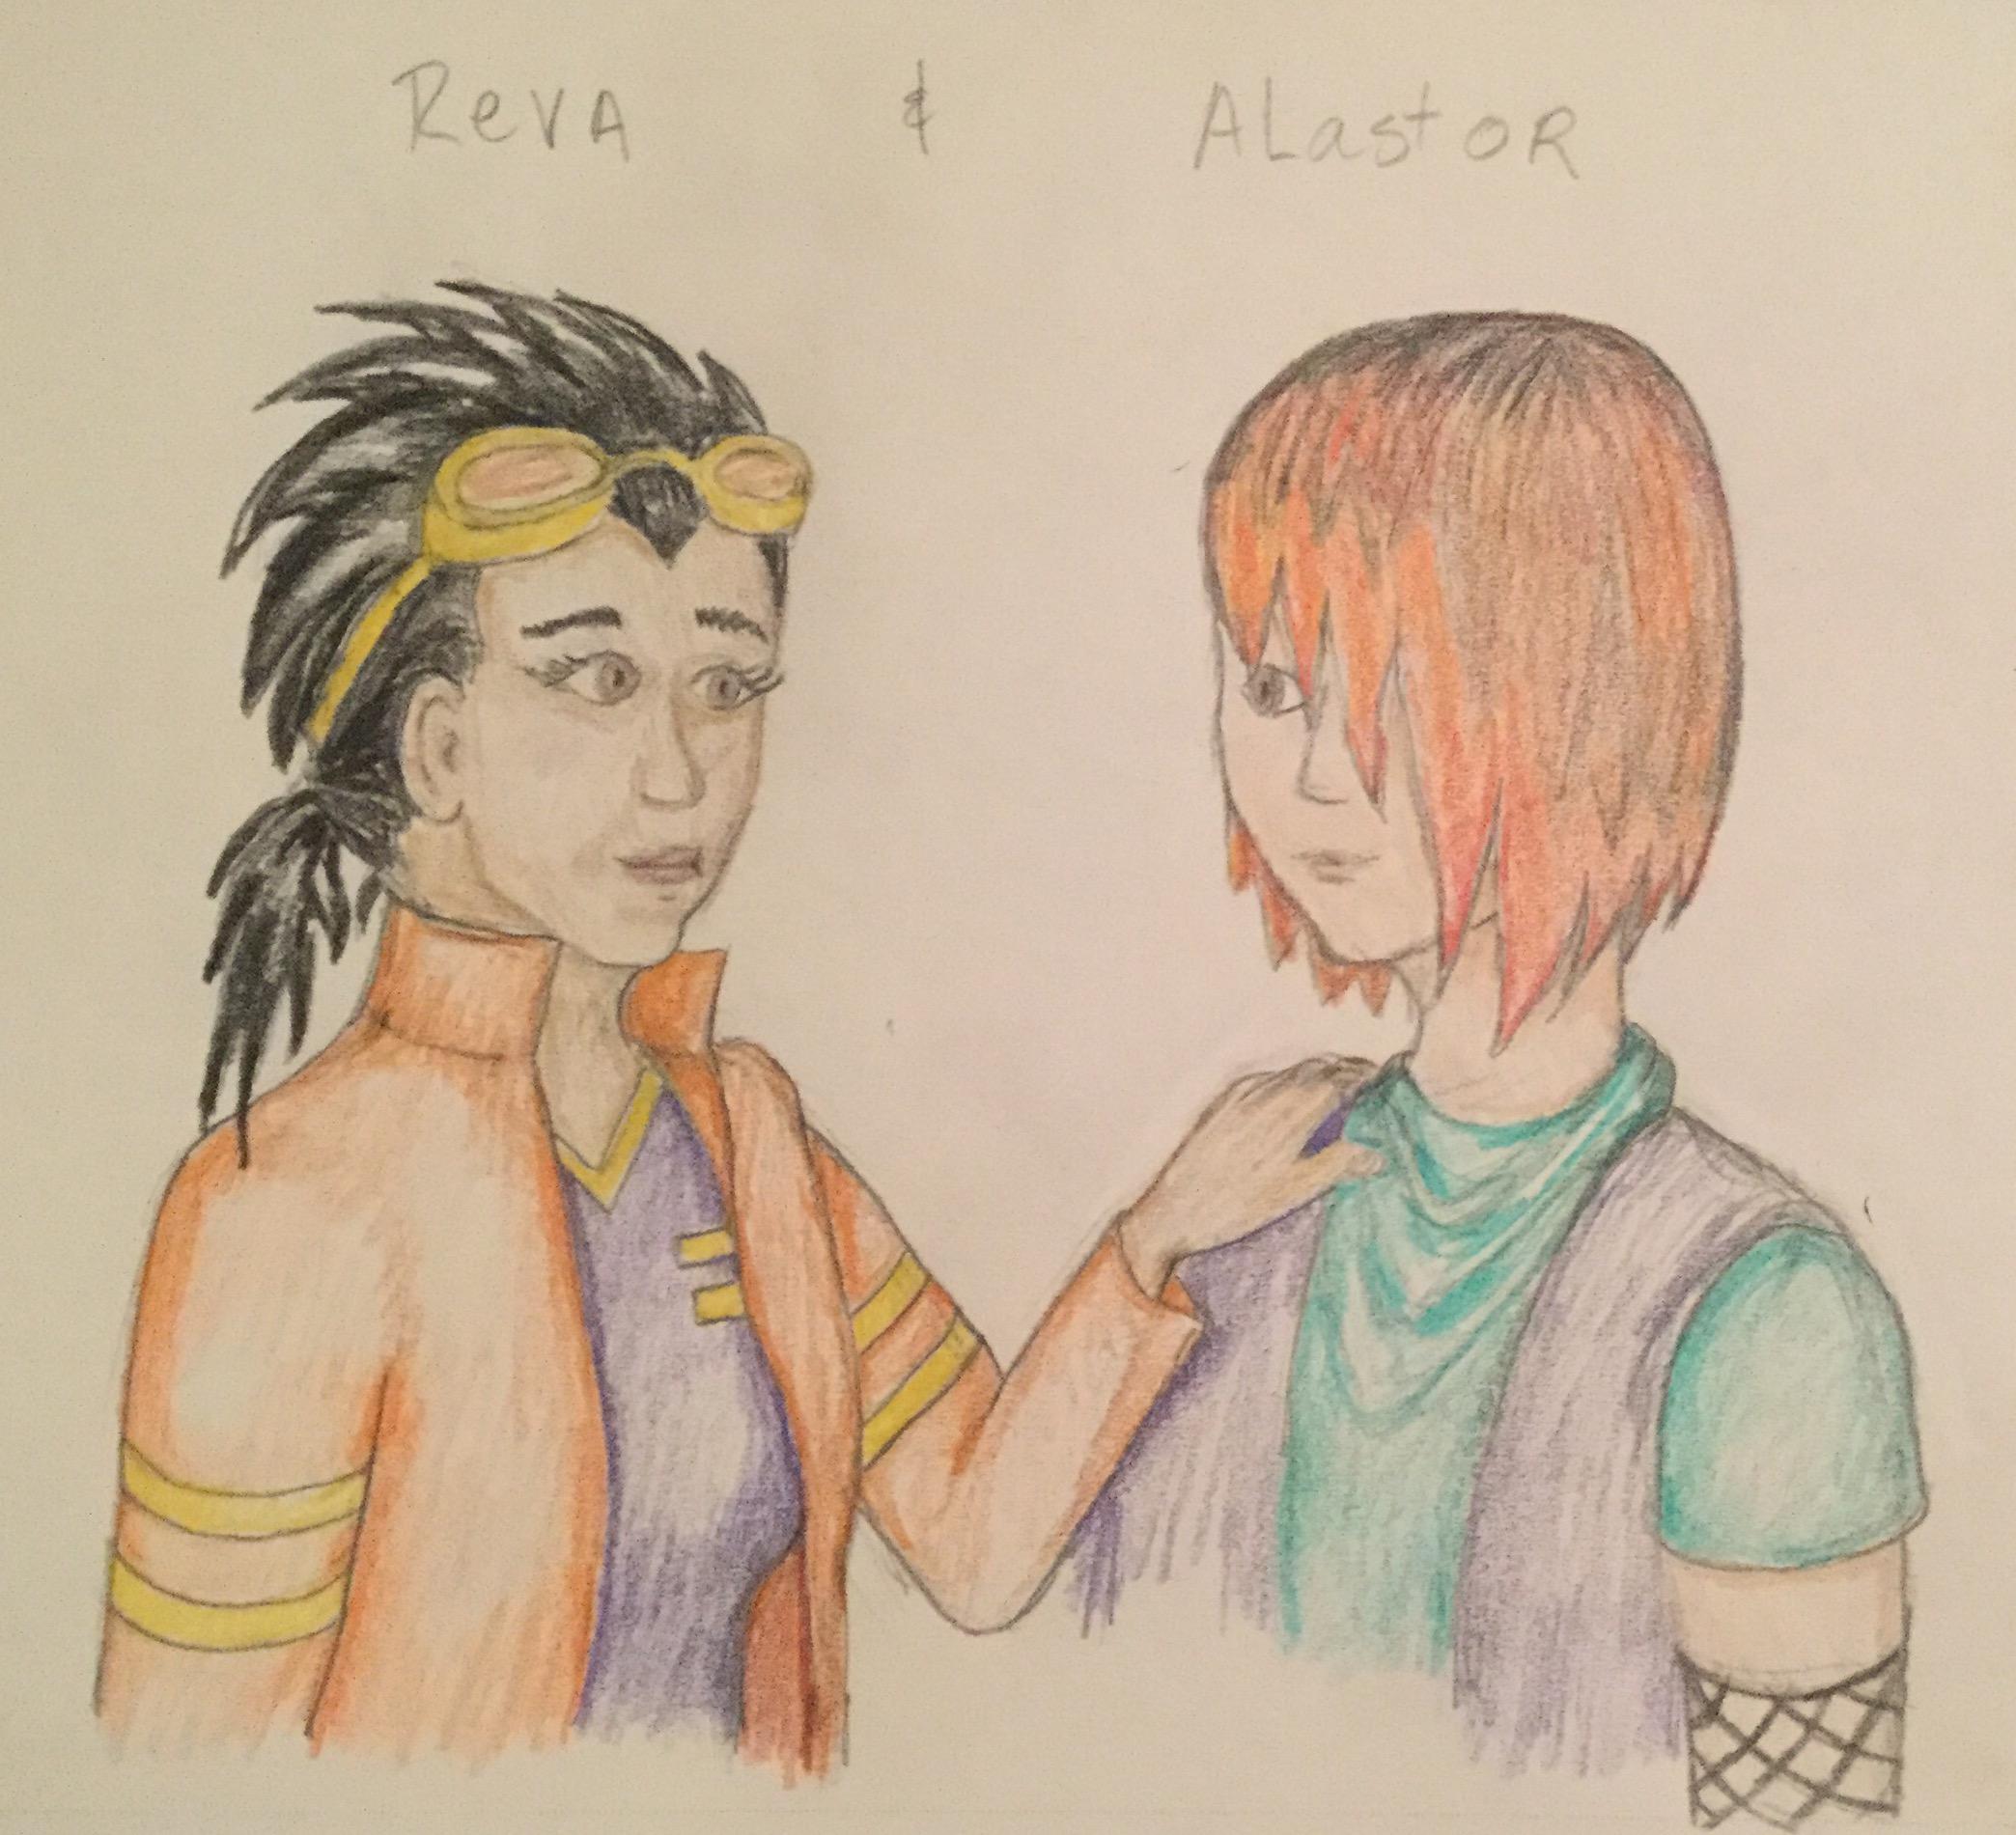 Reva And Alastor by Jadis